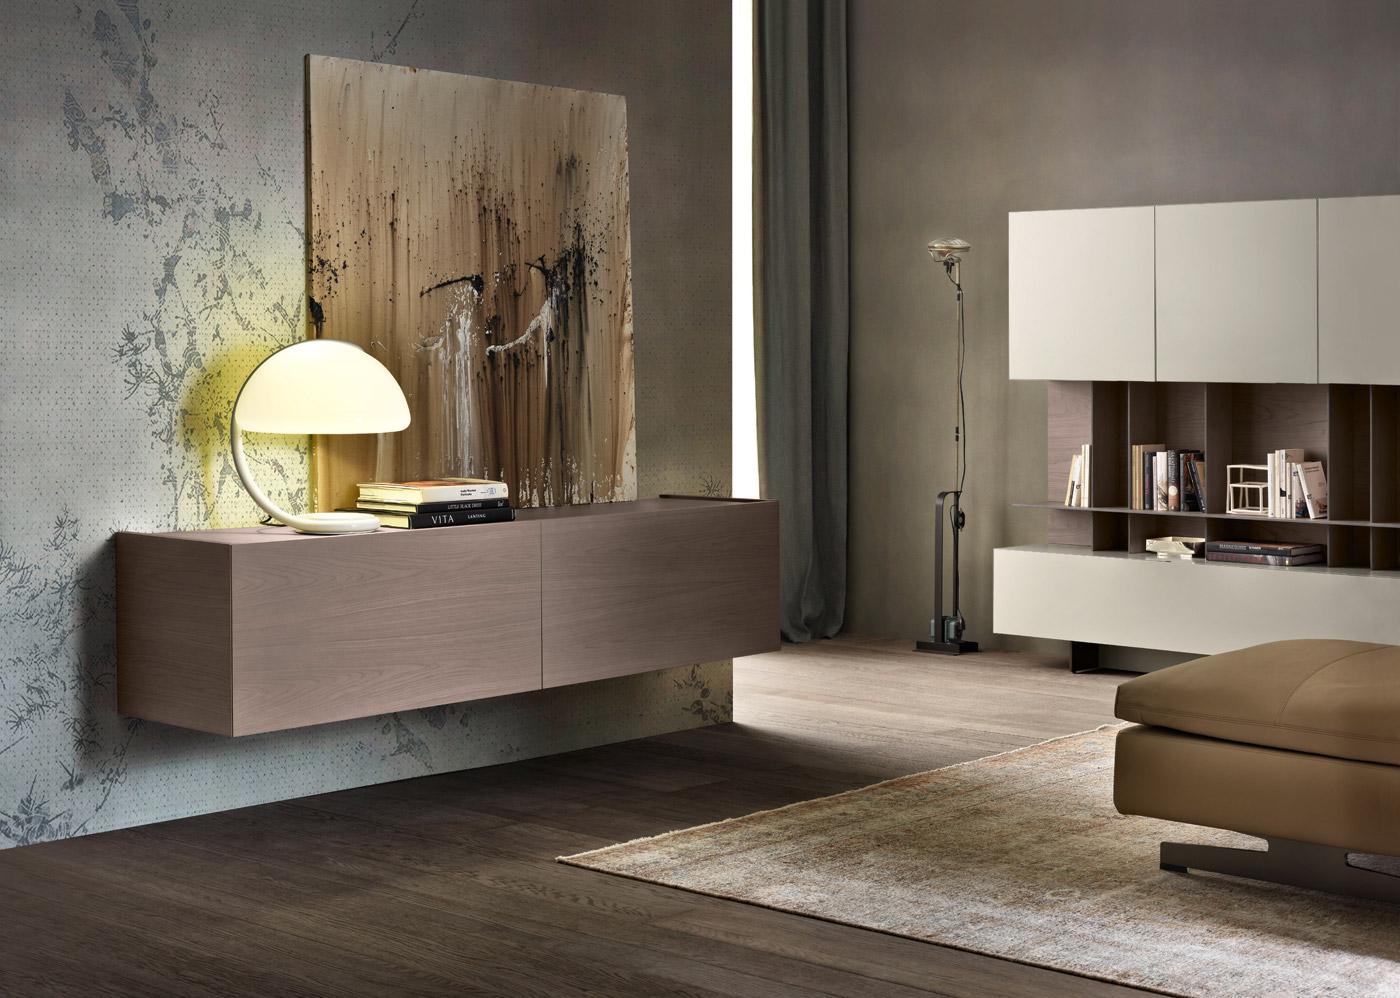 Olivieri mobili furniture design made in italy - Olivieri mobili prezzi ...